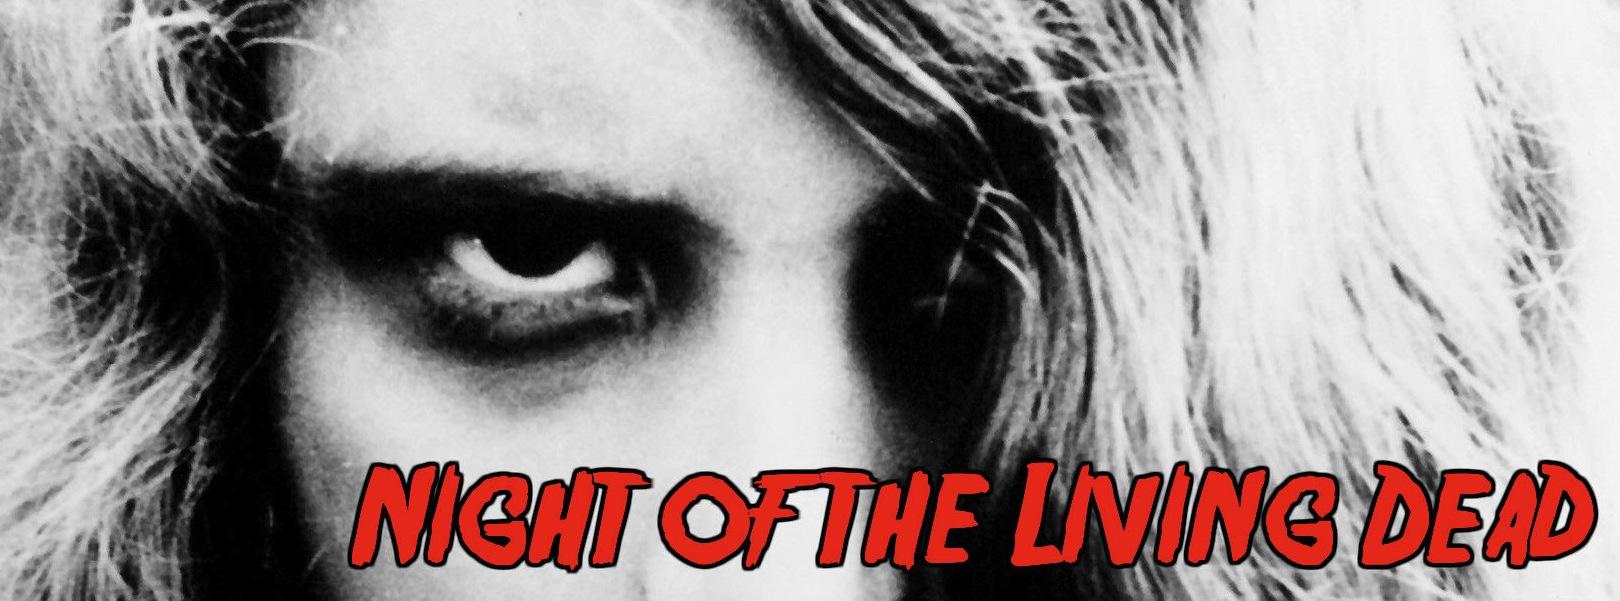 14night-of-the-living-dead-original